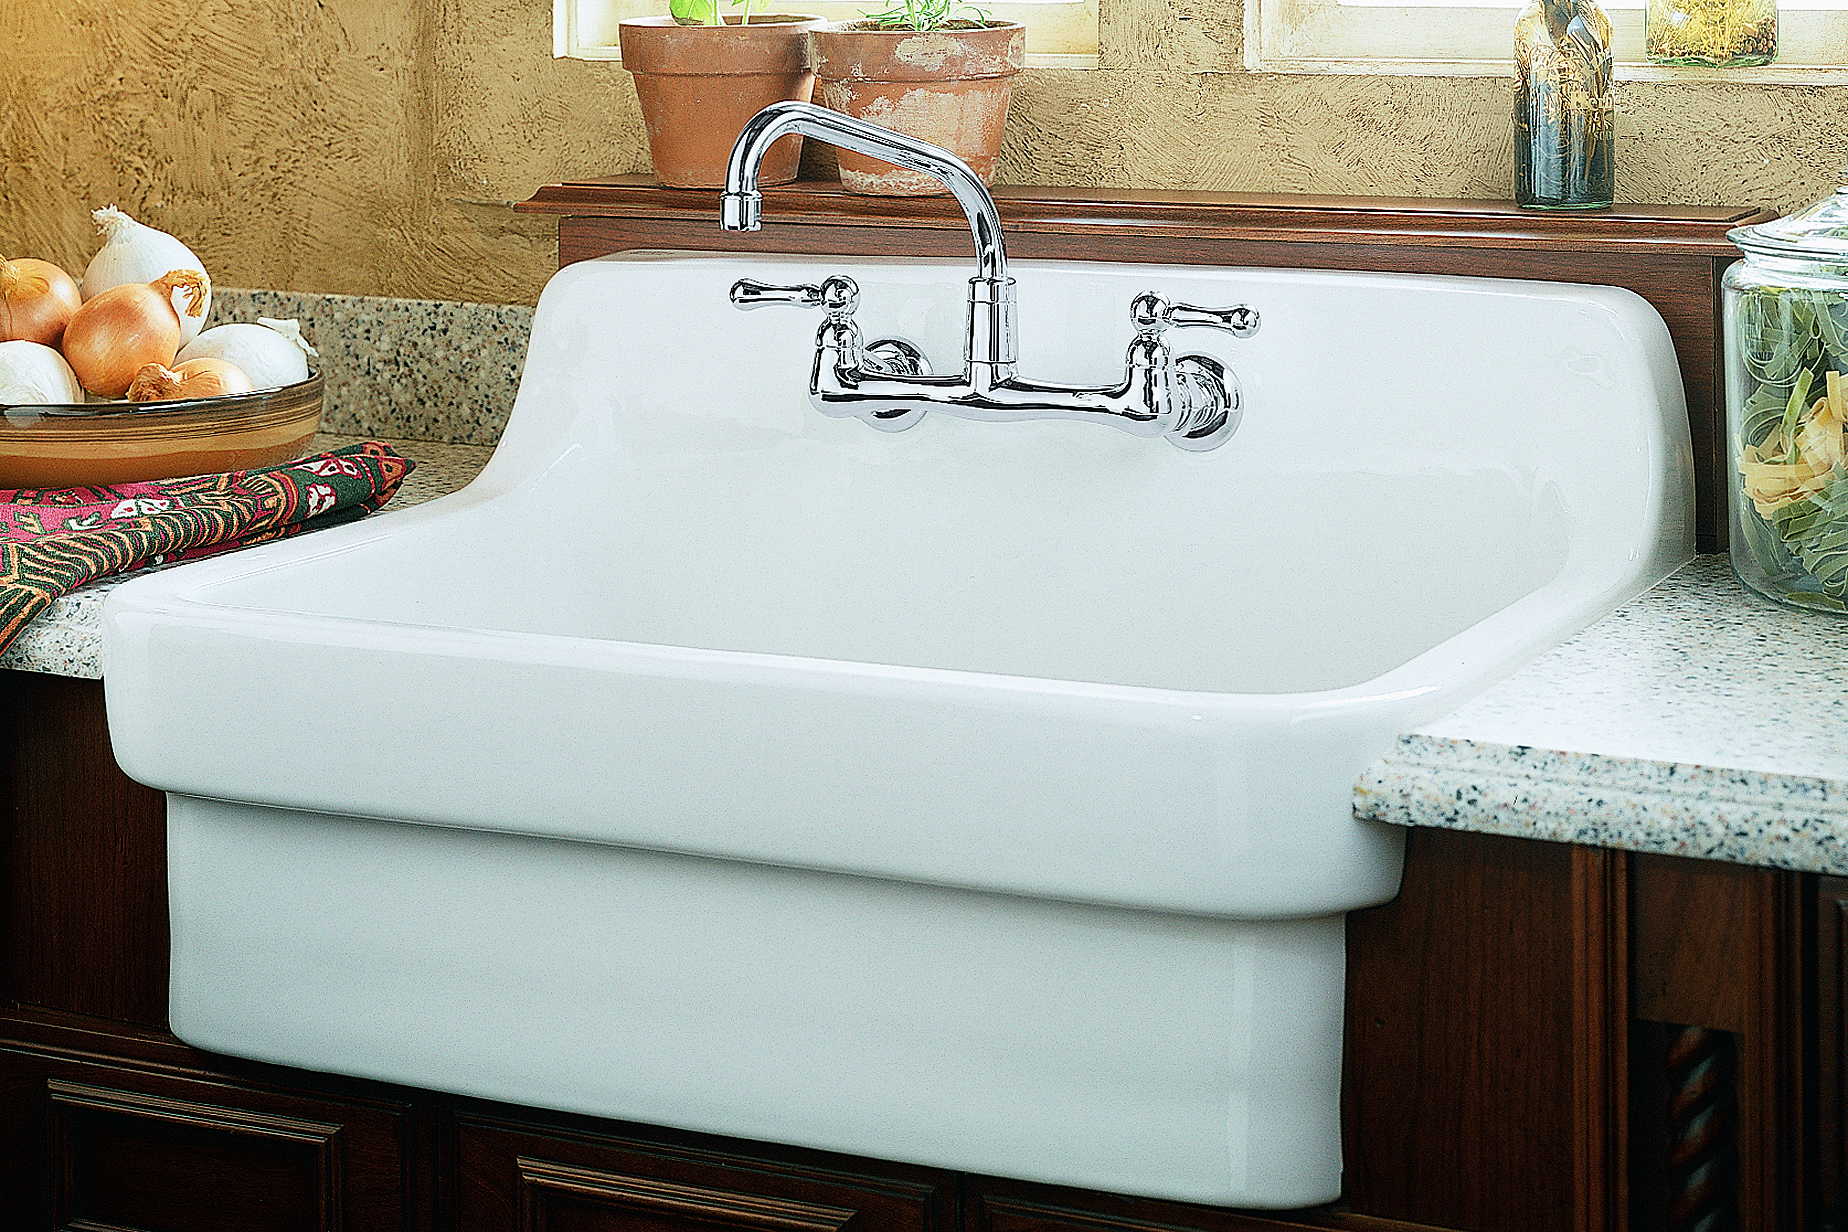 Lennon Plumbing Ltd à Simcoe: Country wall mount sink